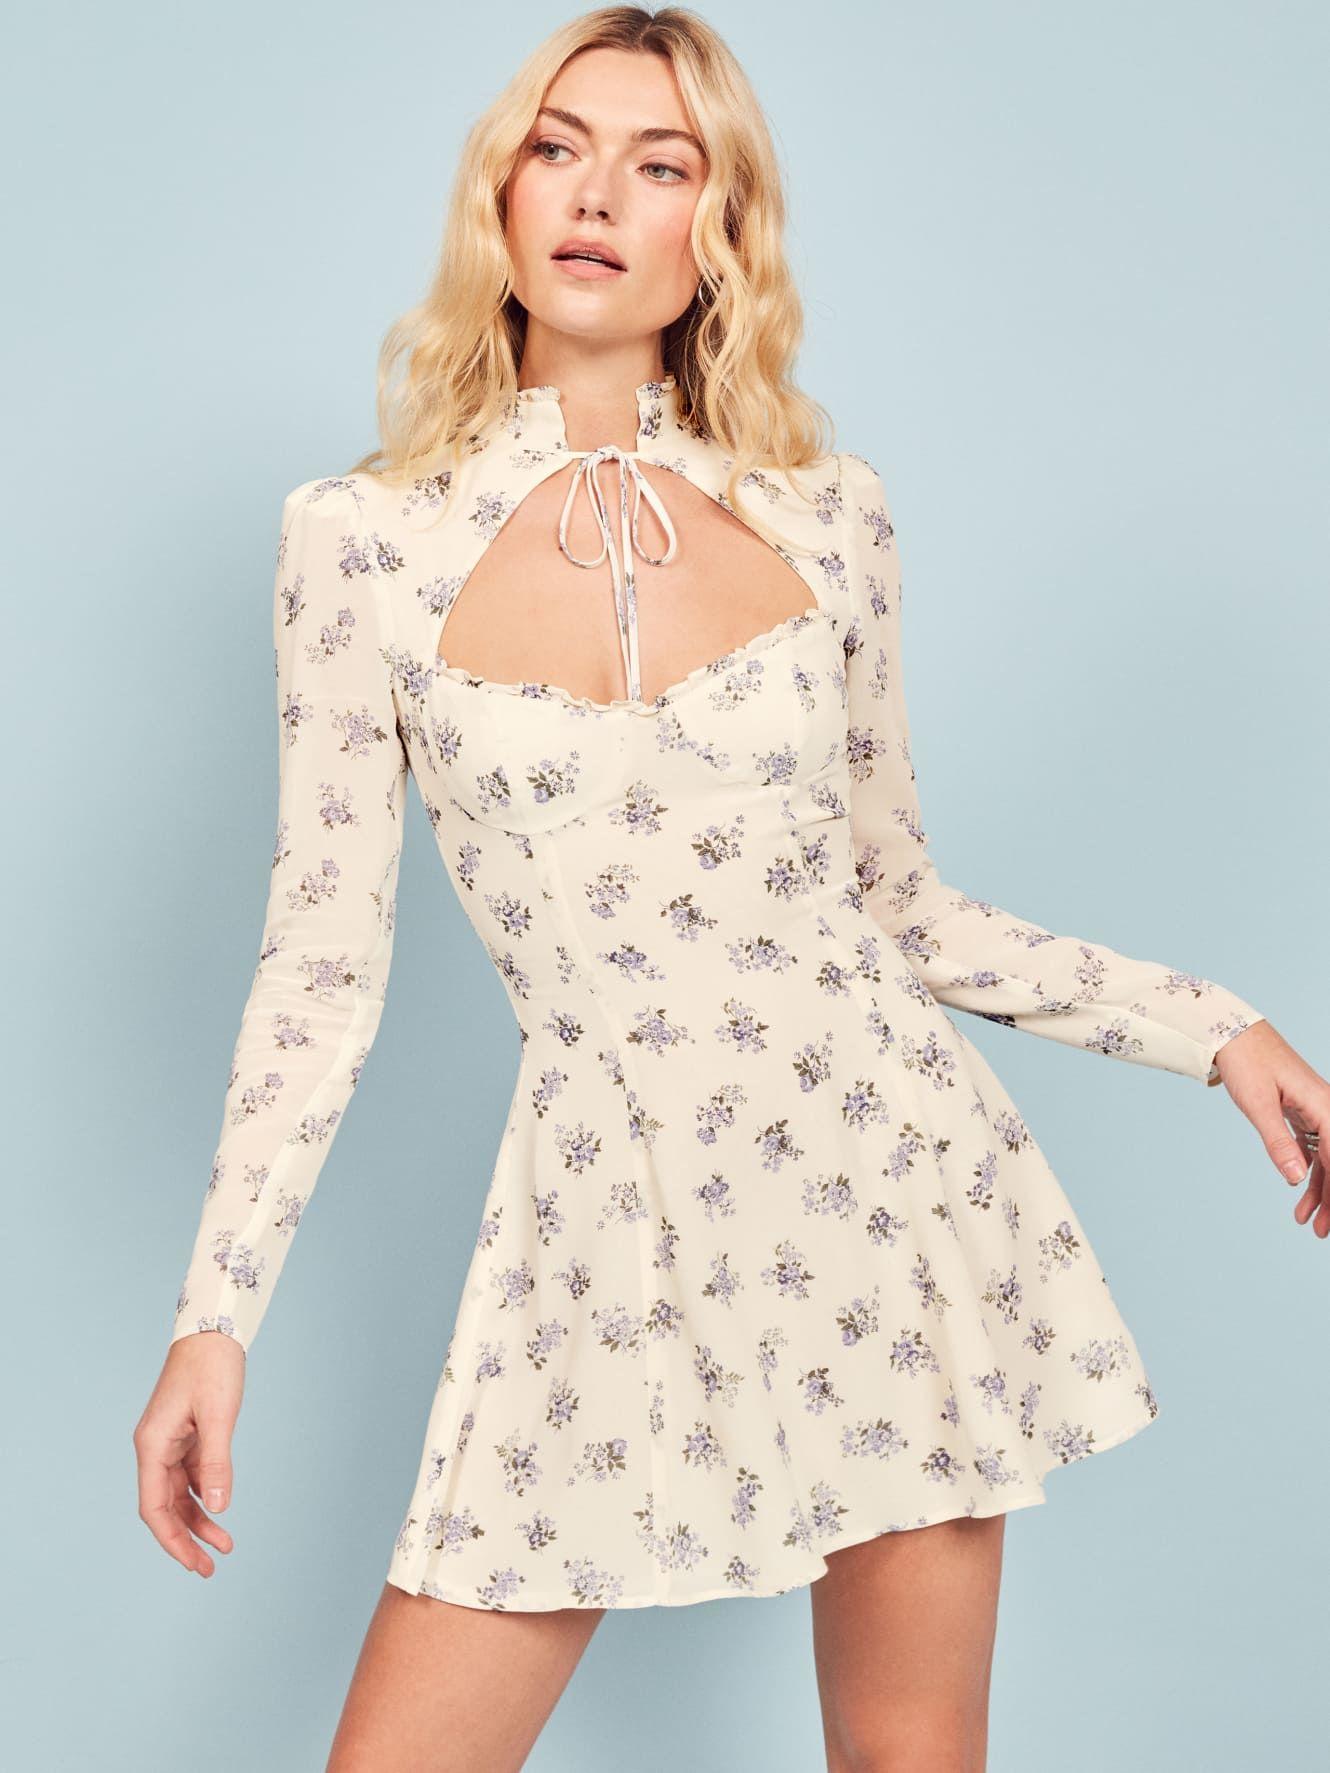 12fea51dc2016c The Vivianne Dress | Dresses in 2019 | Dresses, Fashion, Fashion outfits